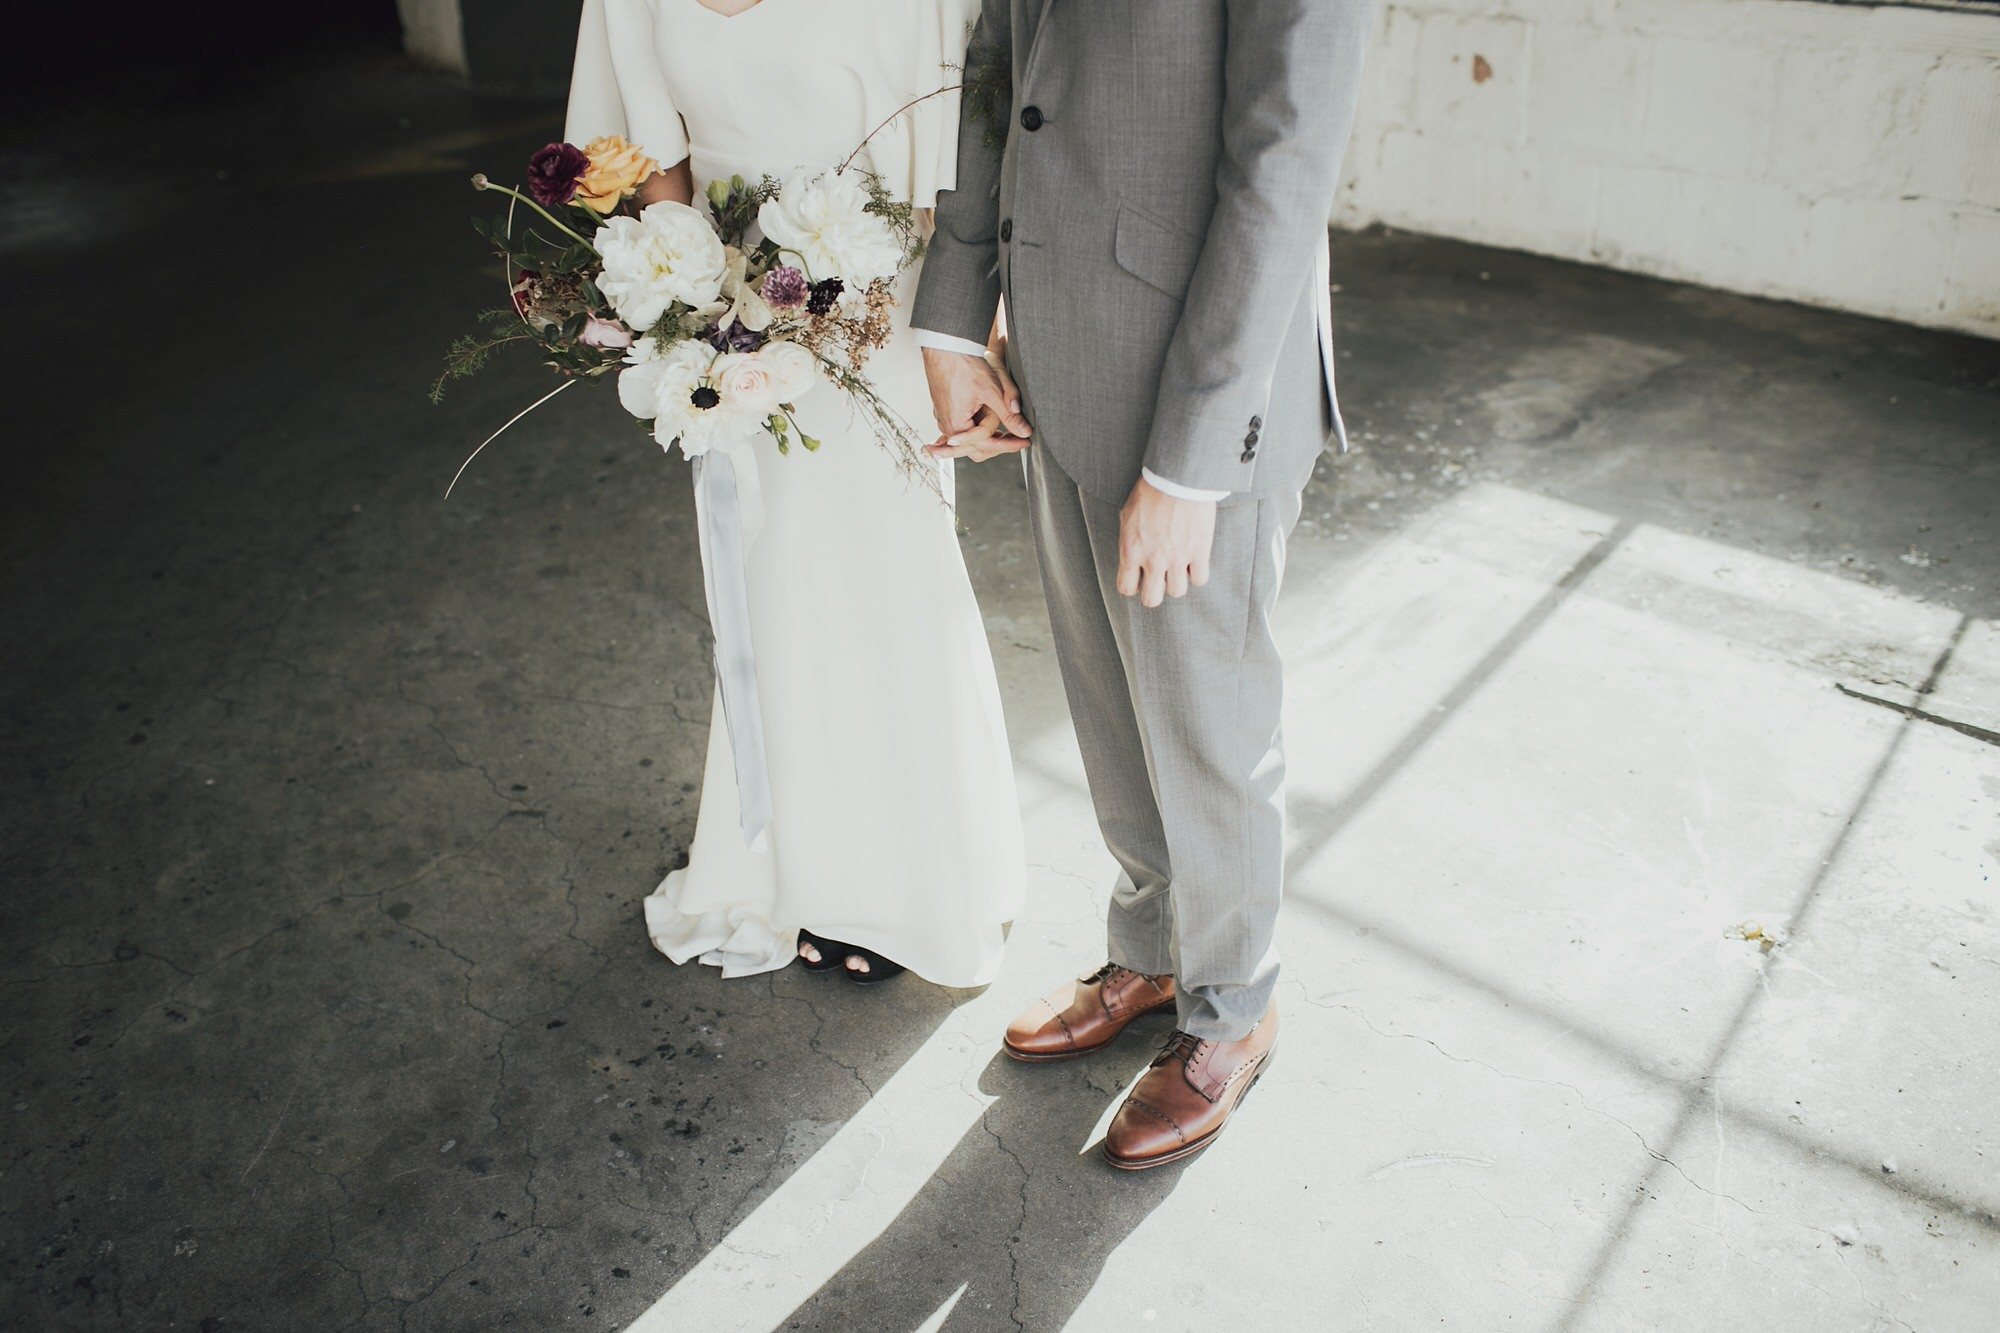 Cool wedding photos of bride and groom in portland oregon